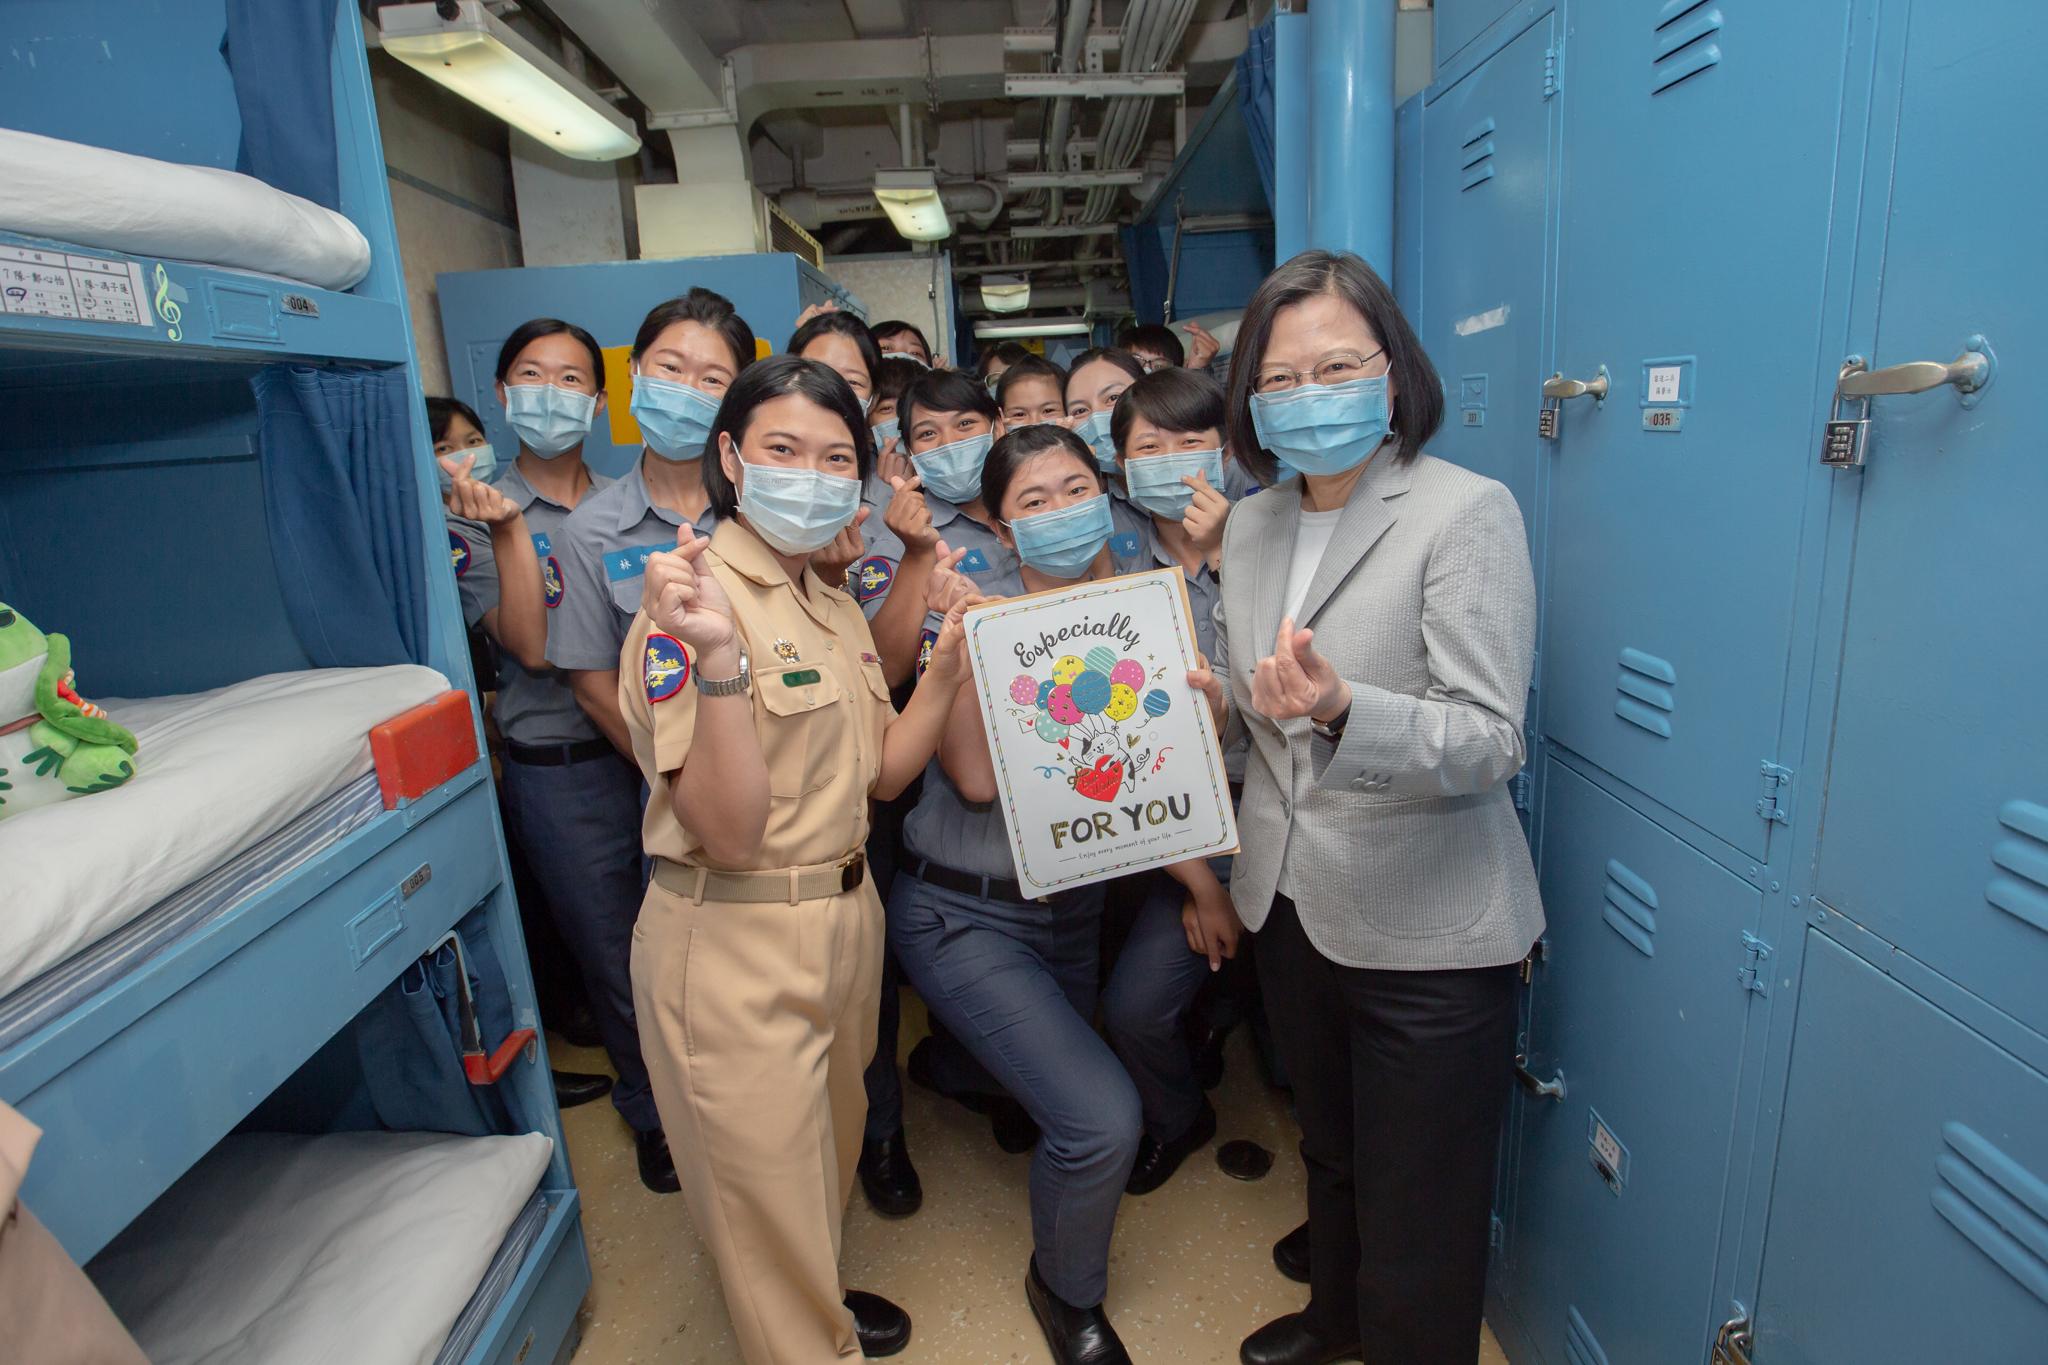 President Tsai Visited Peng-Hu Garrison Units to Recognize Contribution